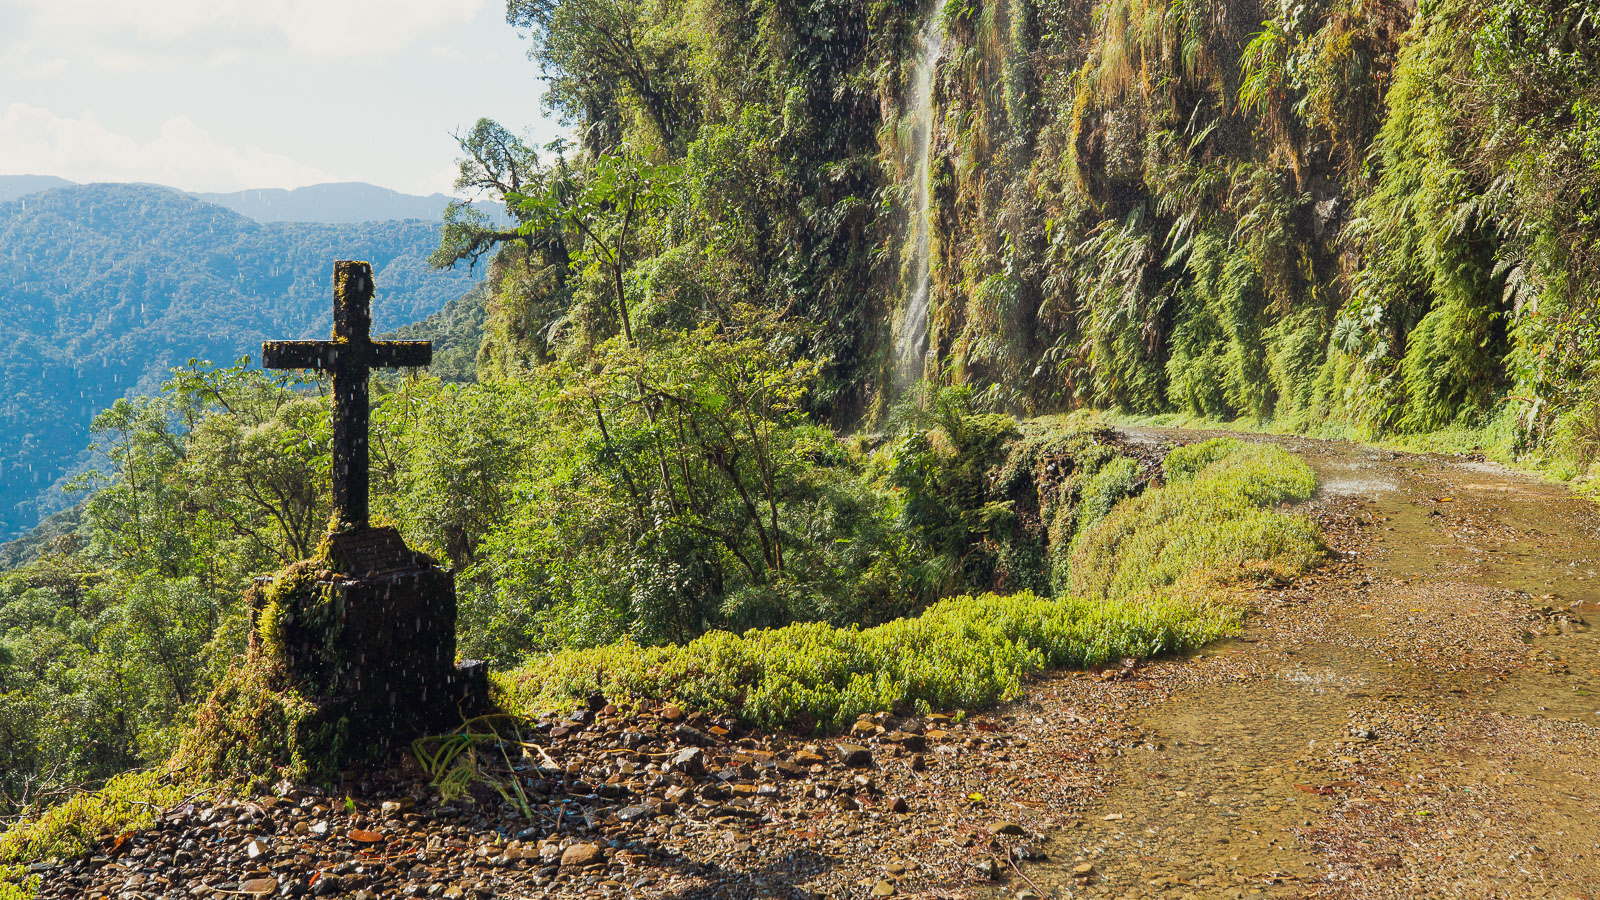 Bolivia: Bikepacking the El Choro Trek & the Death Road